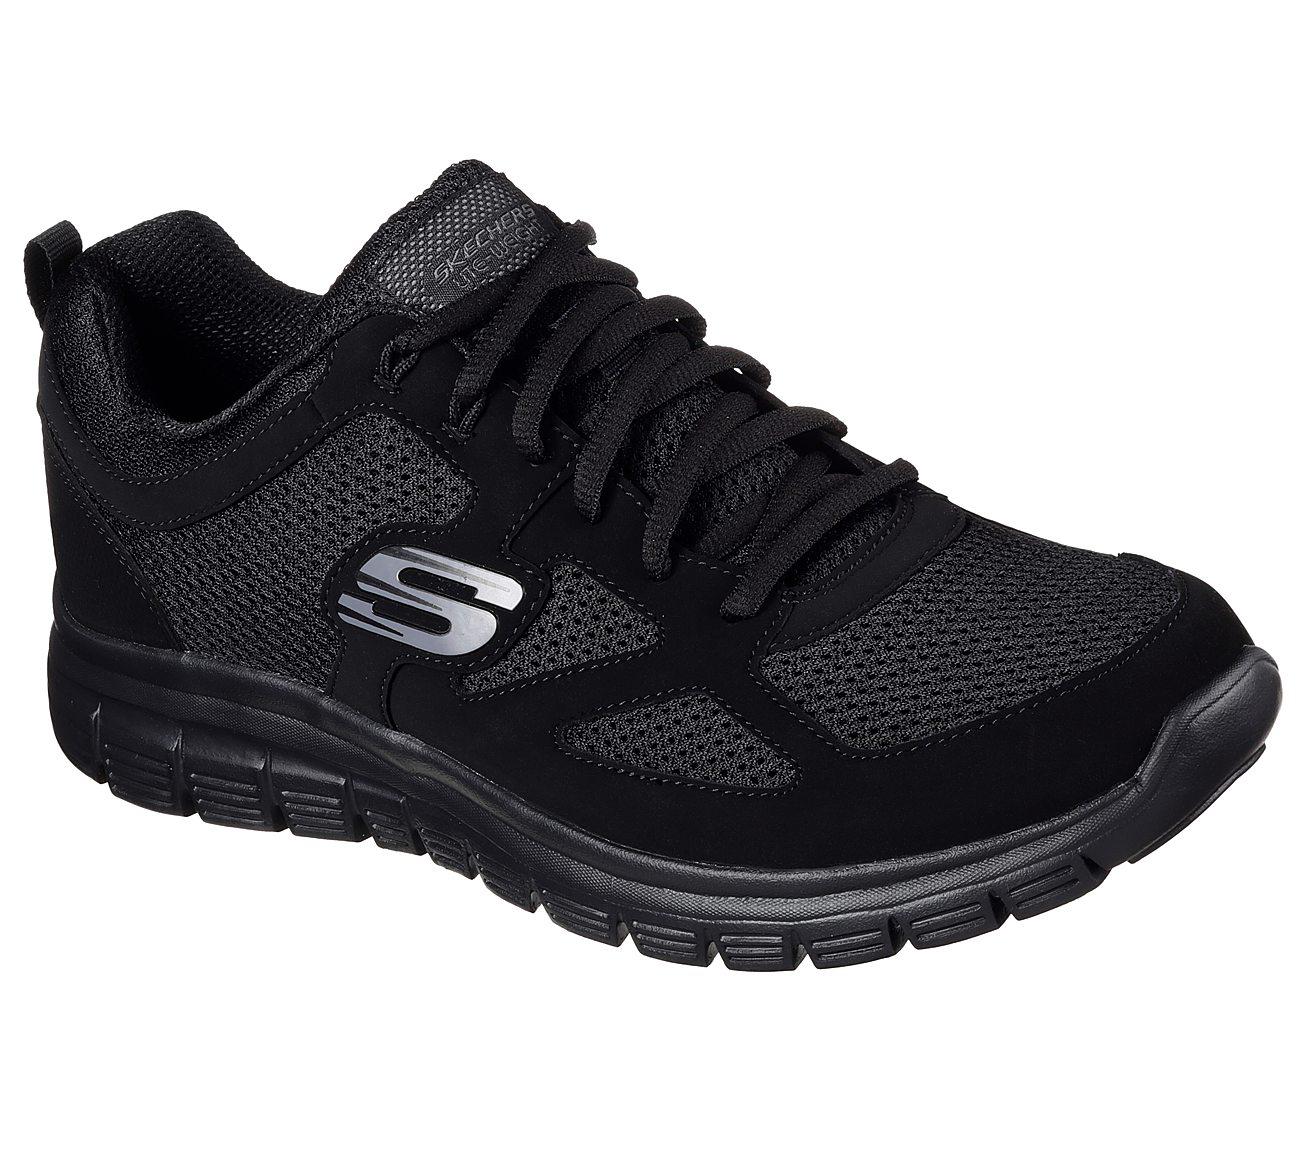 scarpe skechers memory foam uomo prezzi